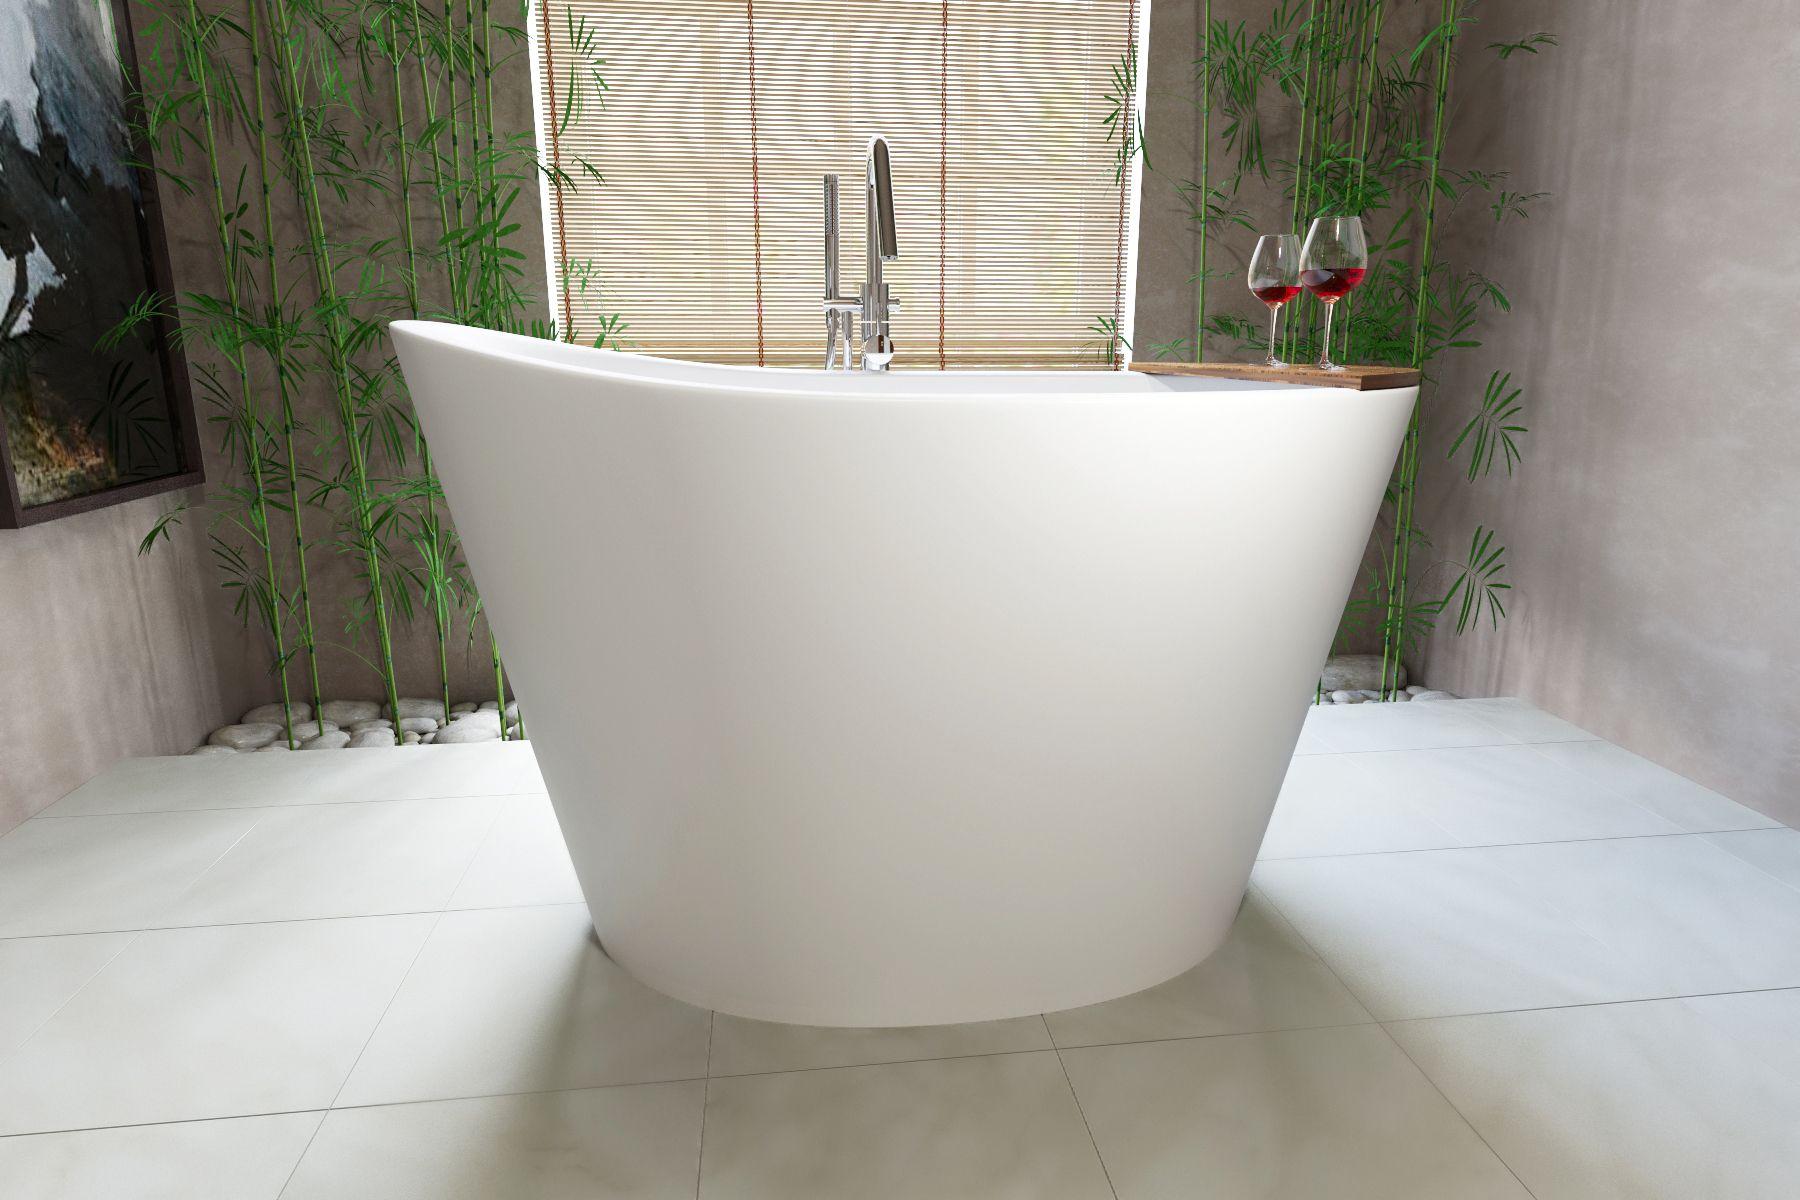 Aquatica True Ofuro Freestanding Stone Anese Soaking Bathtub